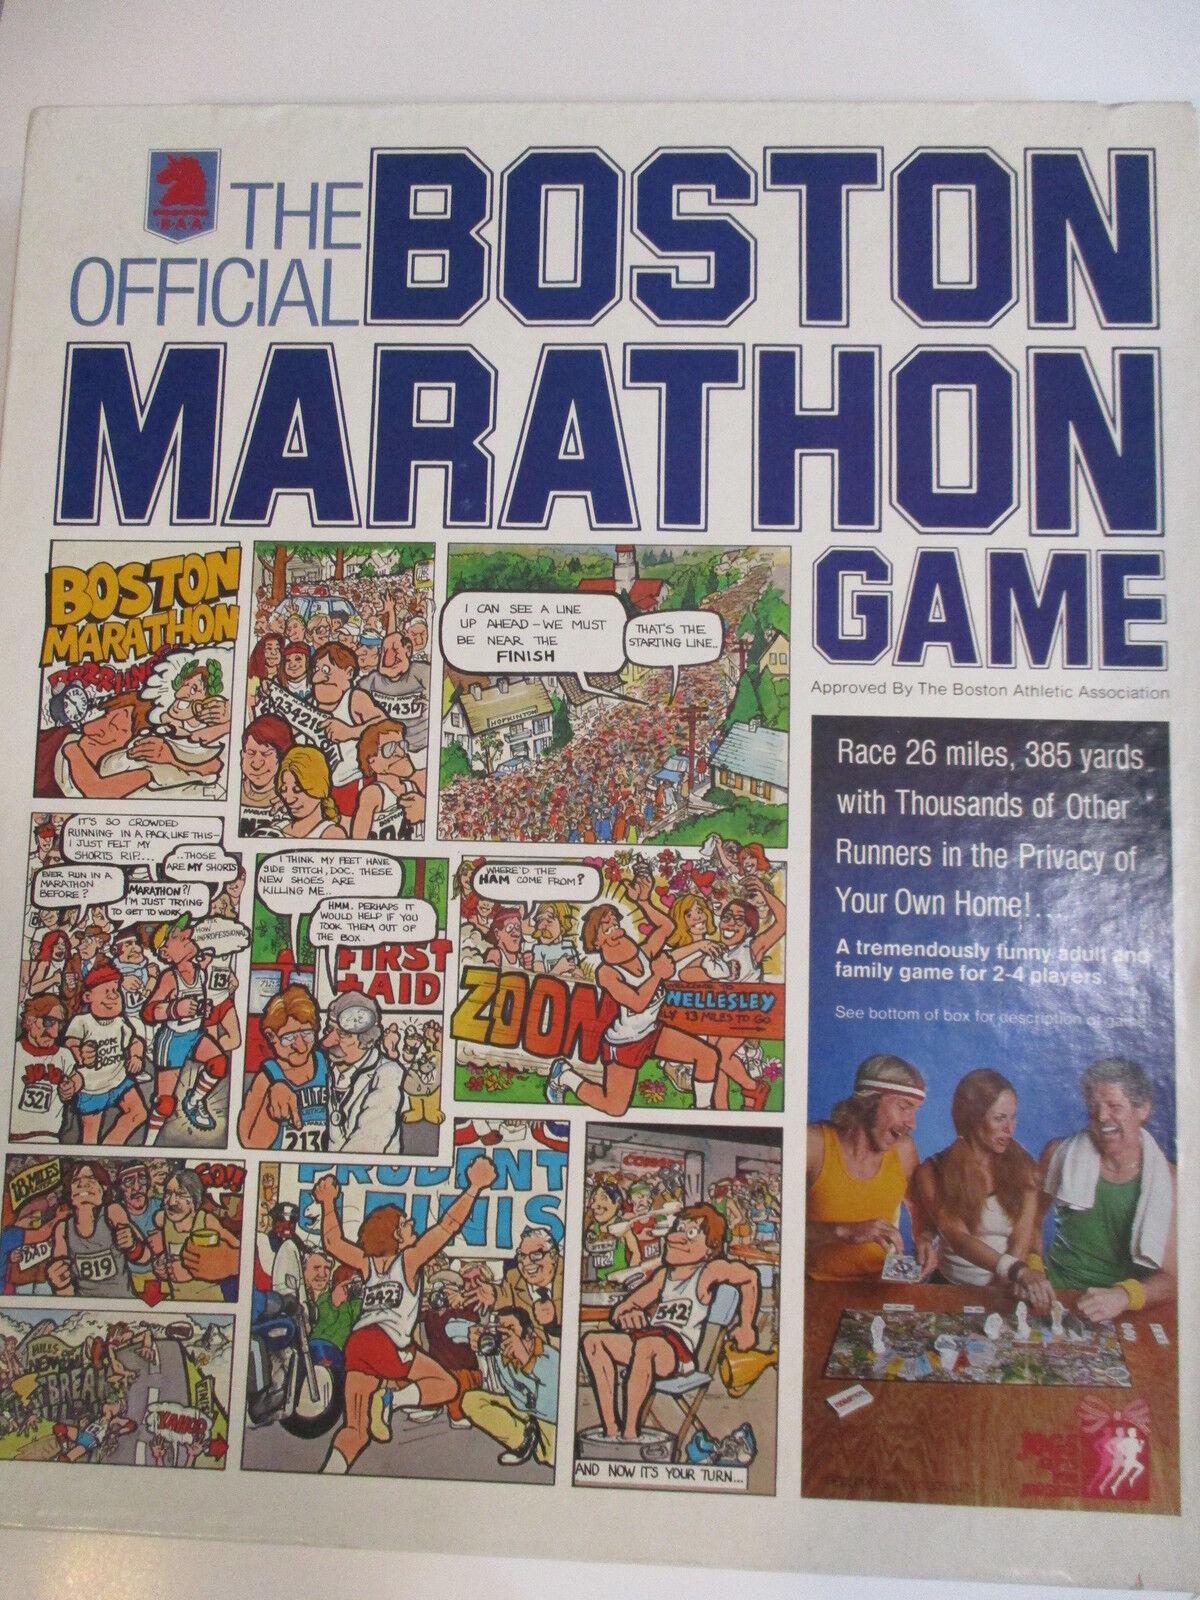 RAME s officiella Boston Marathon Game 1978 Fullständig RARE årgång